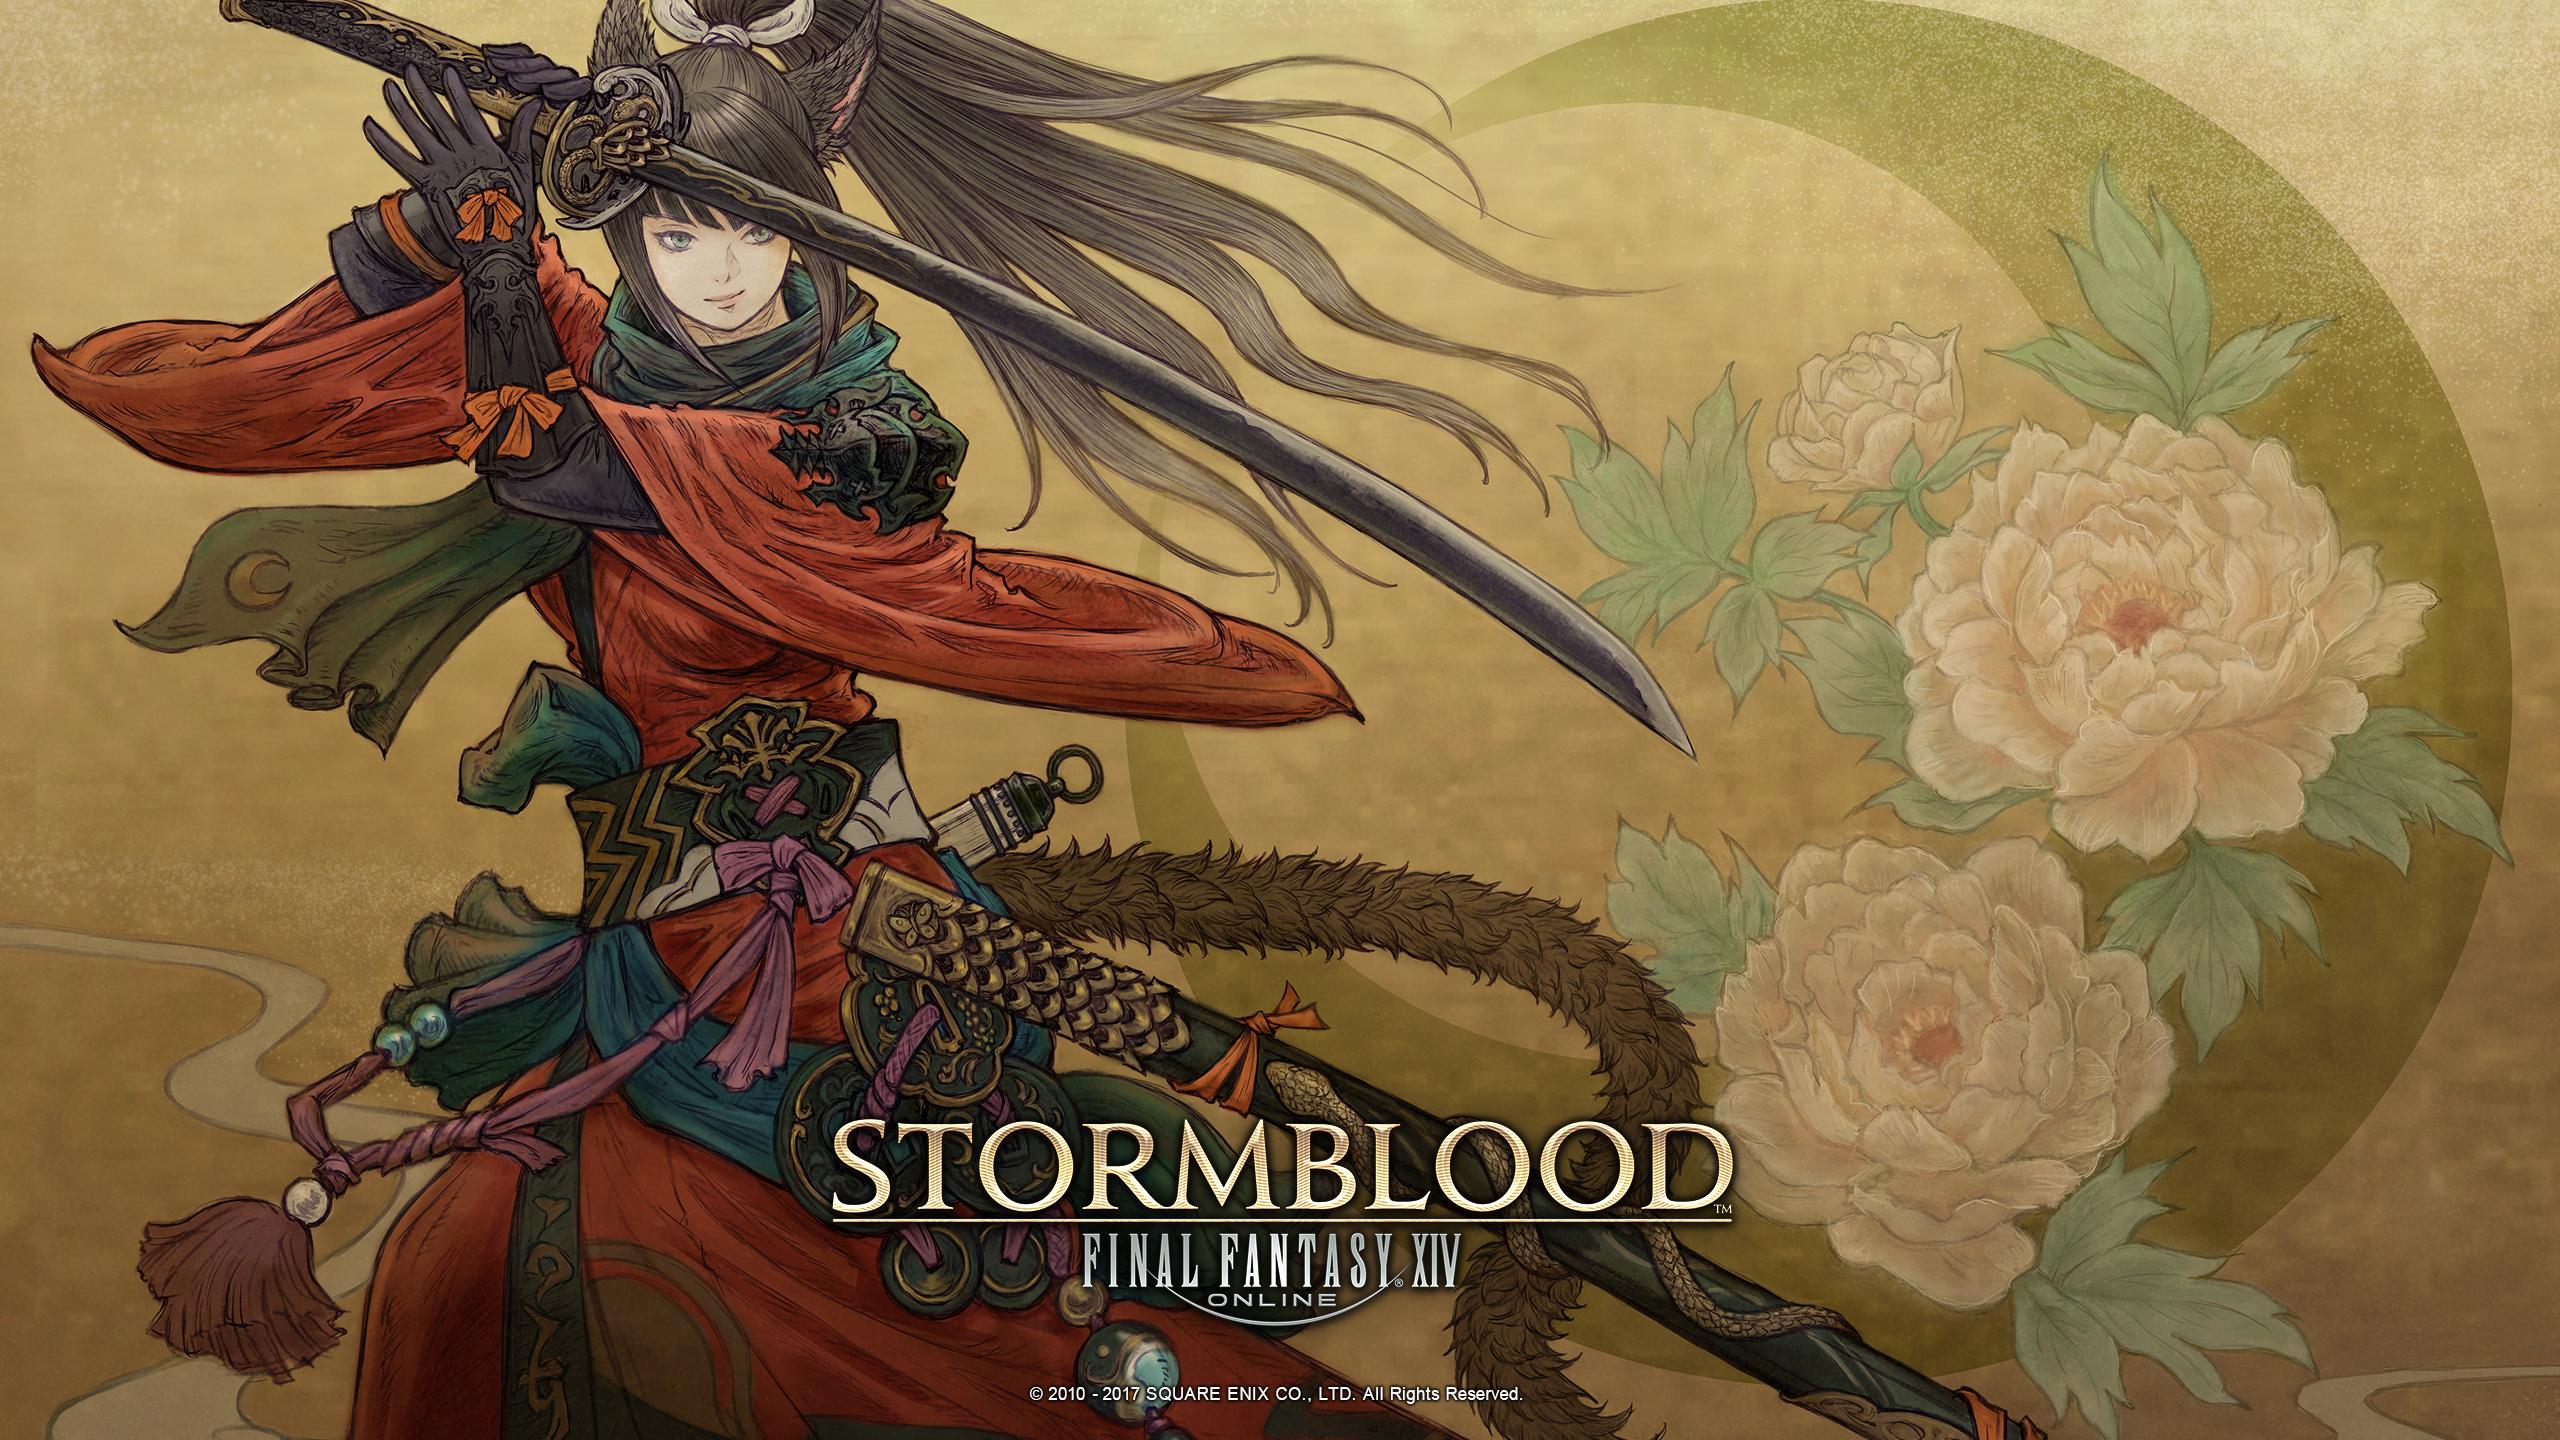 Fantasy Character Art Samurai 2560x1440 Download Hd Wallpaper Wallpapertip